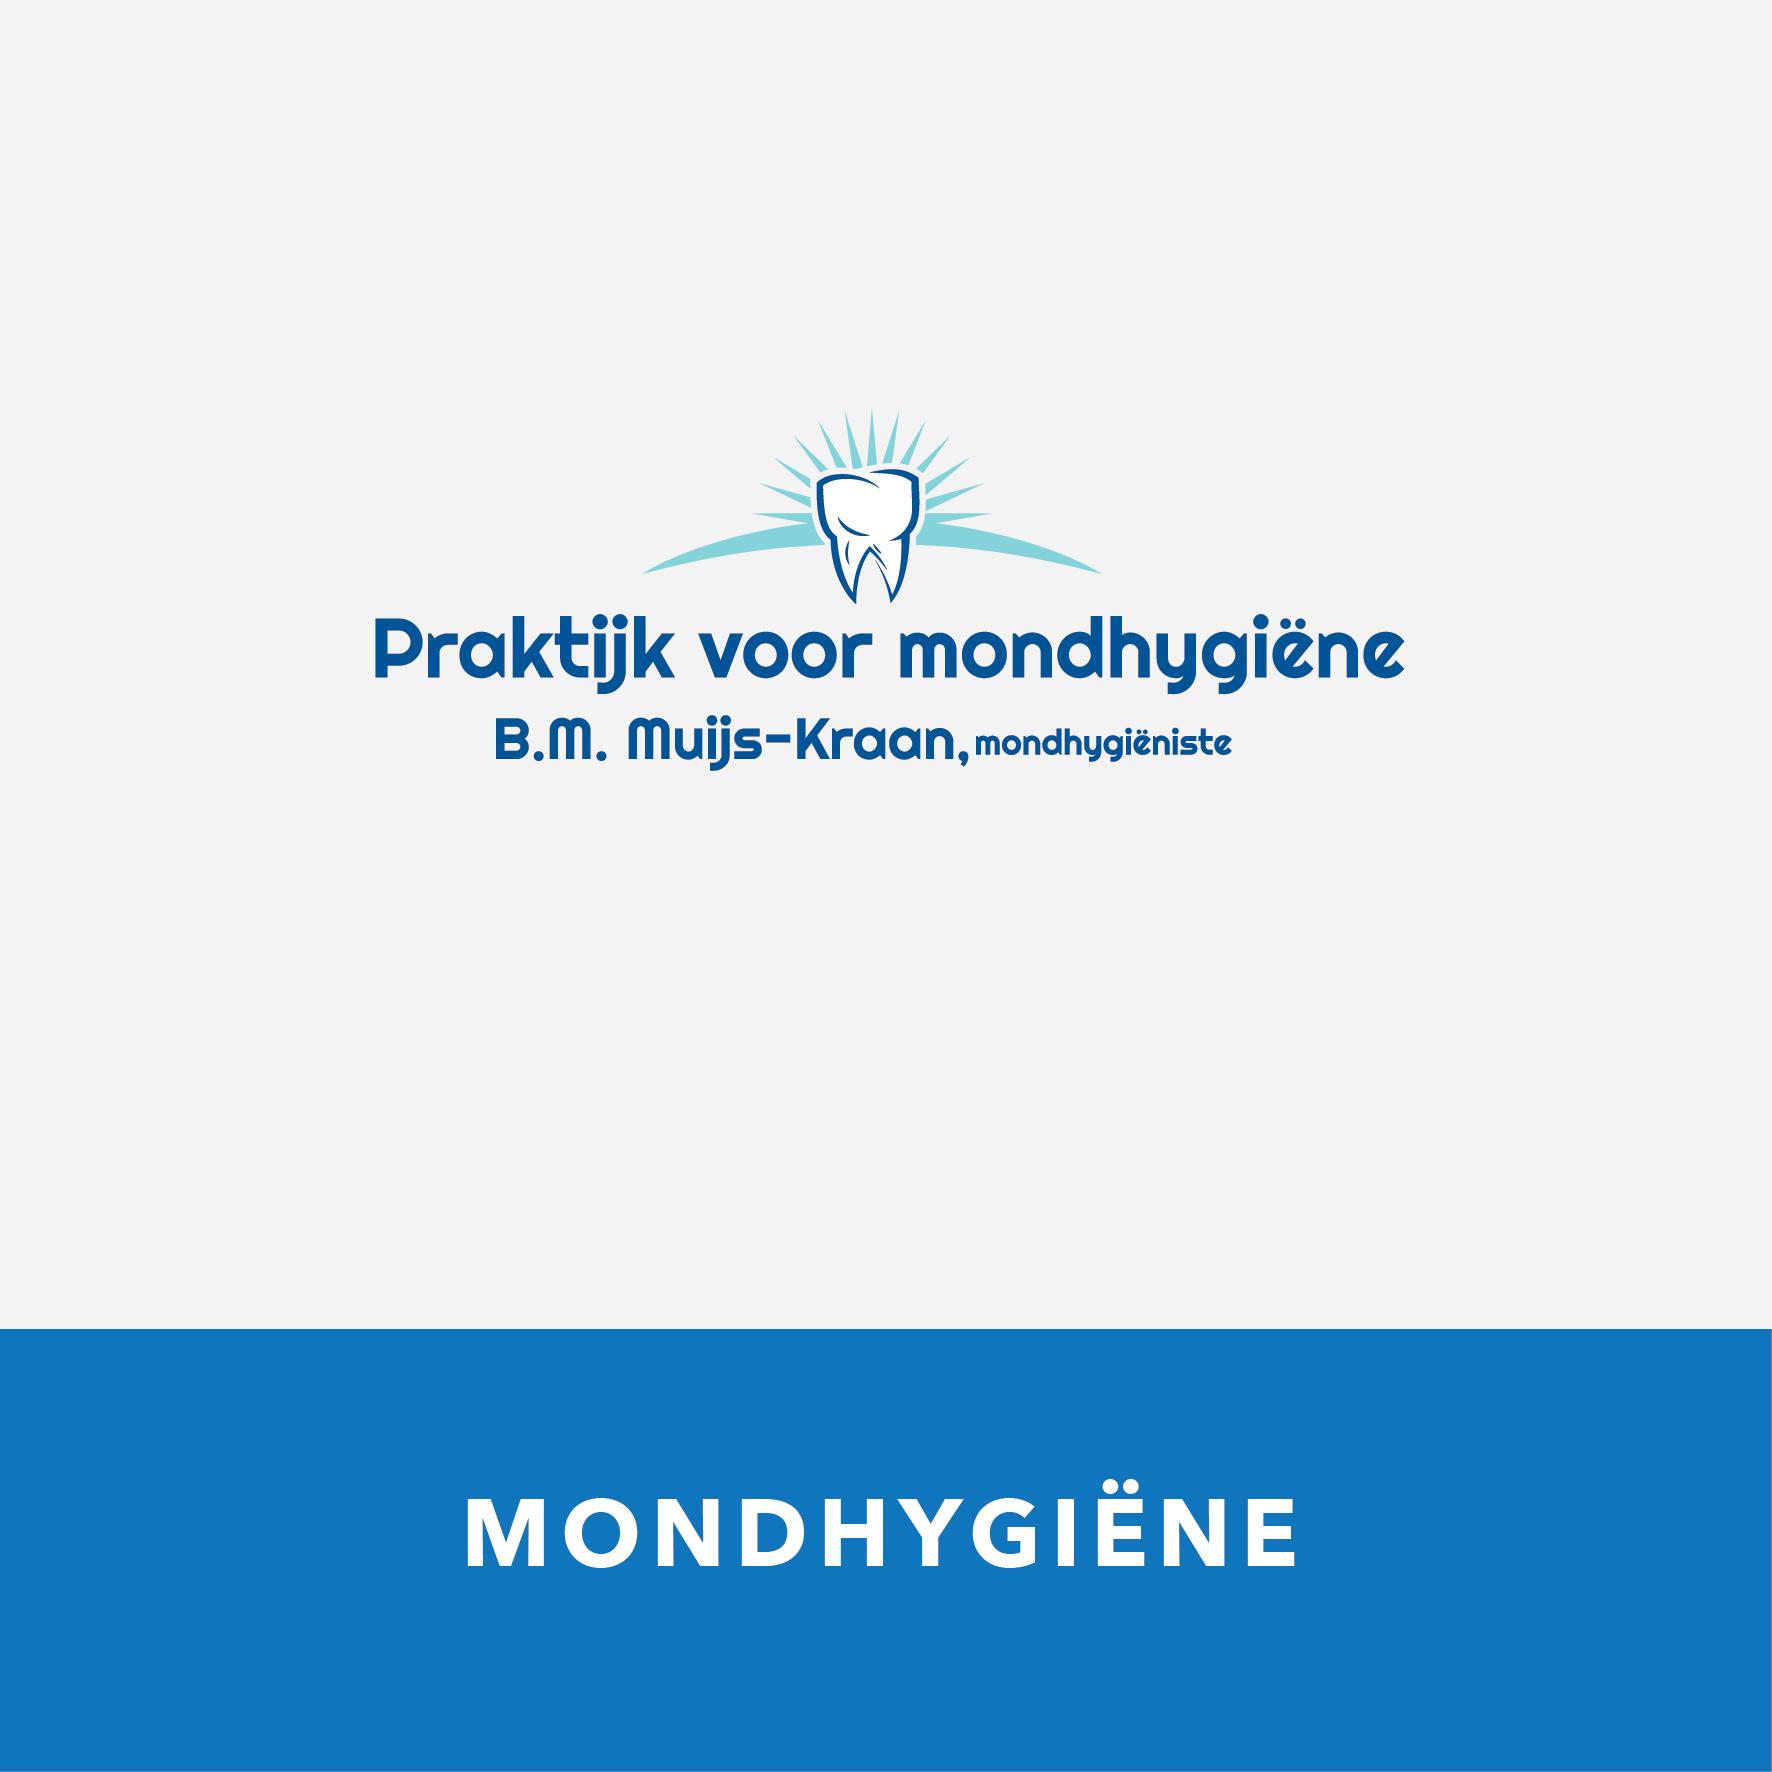 mondhygiene-MMC.png